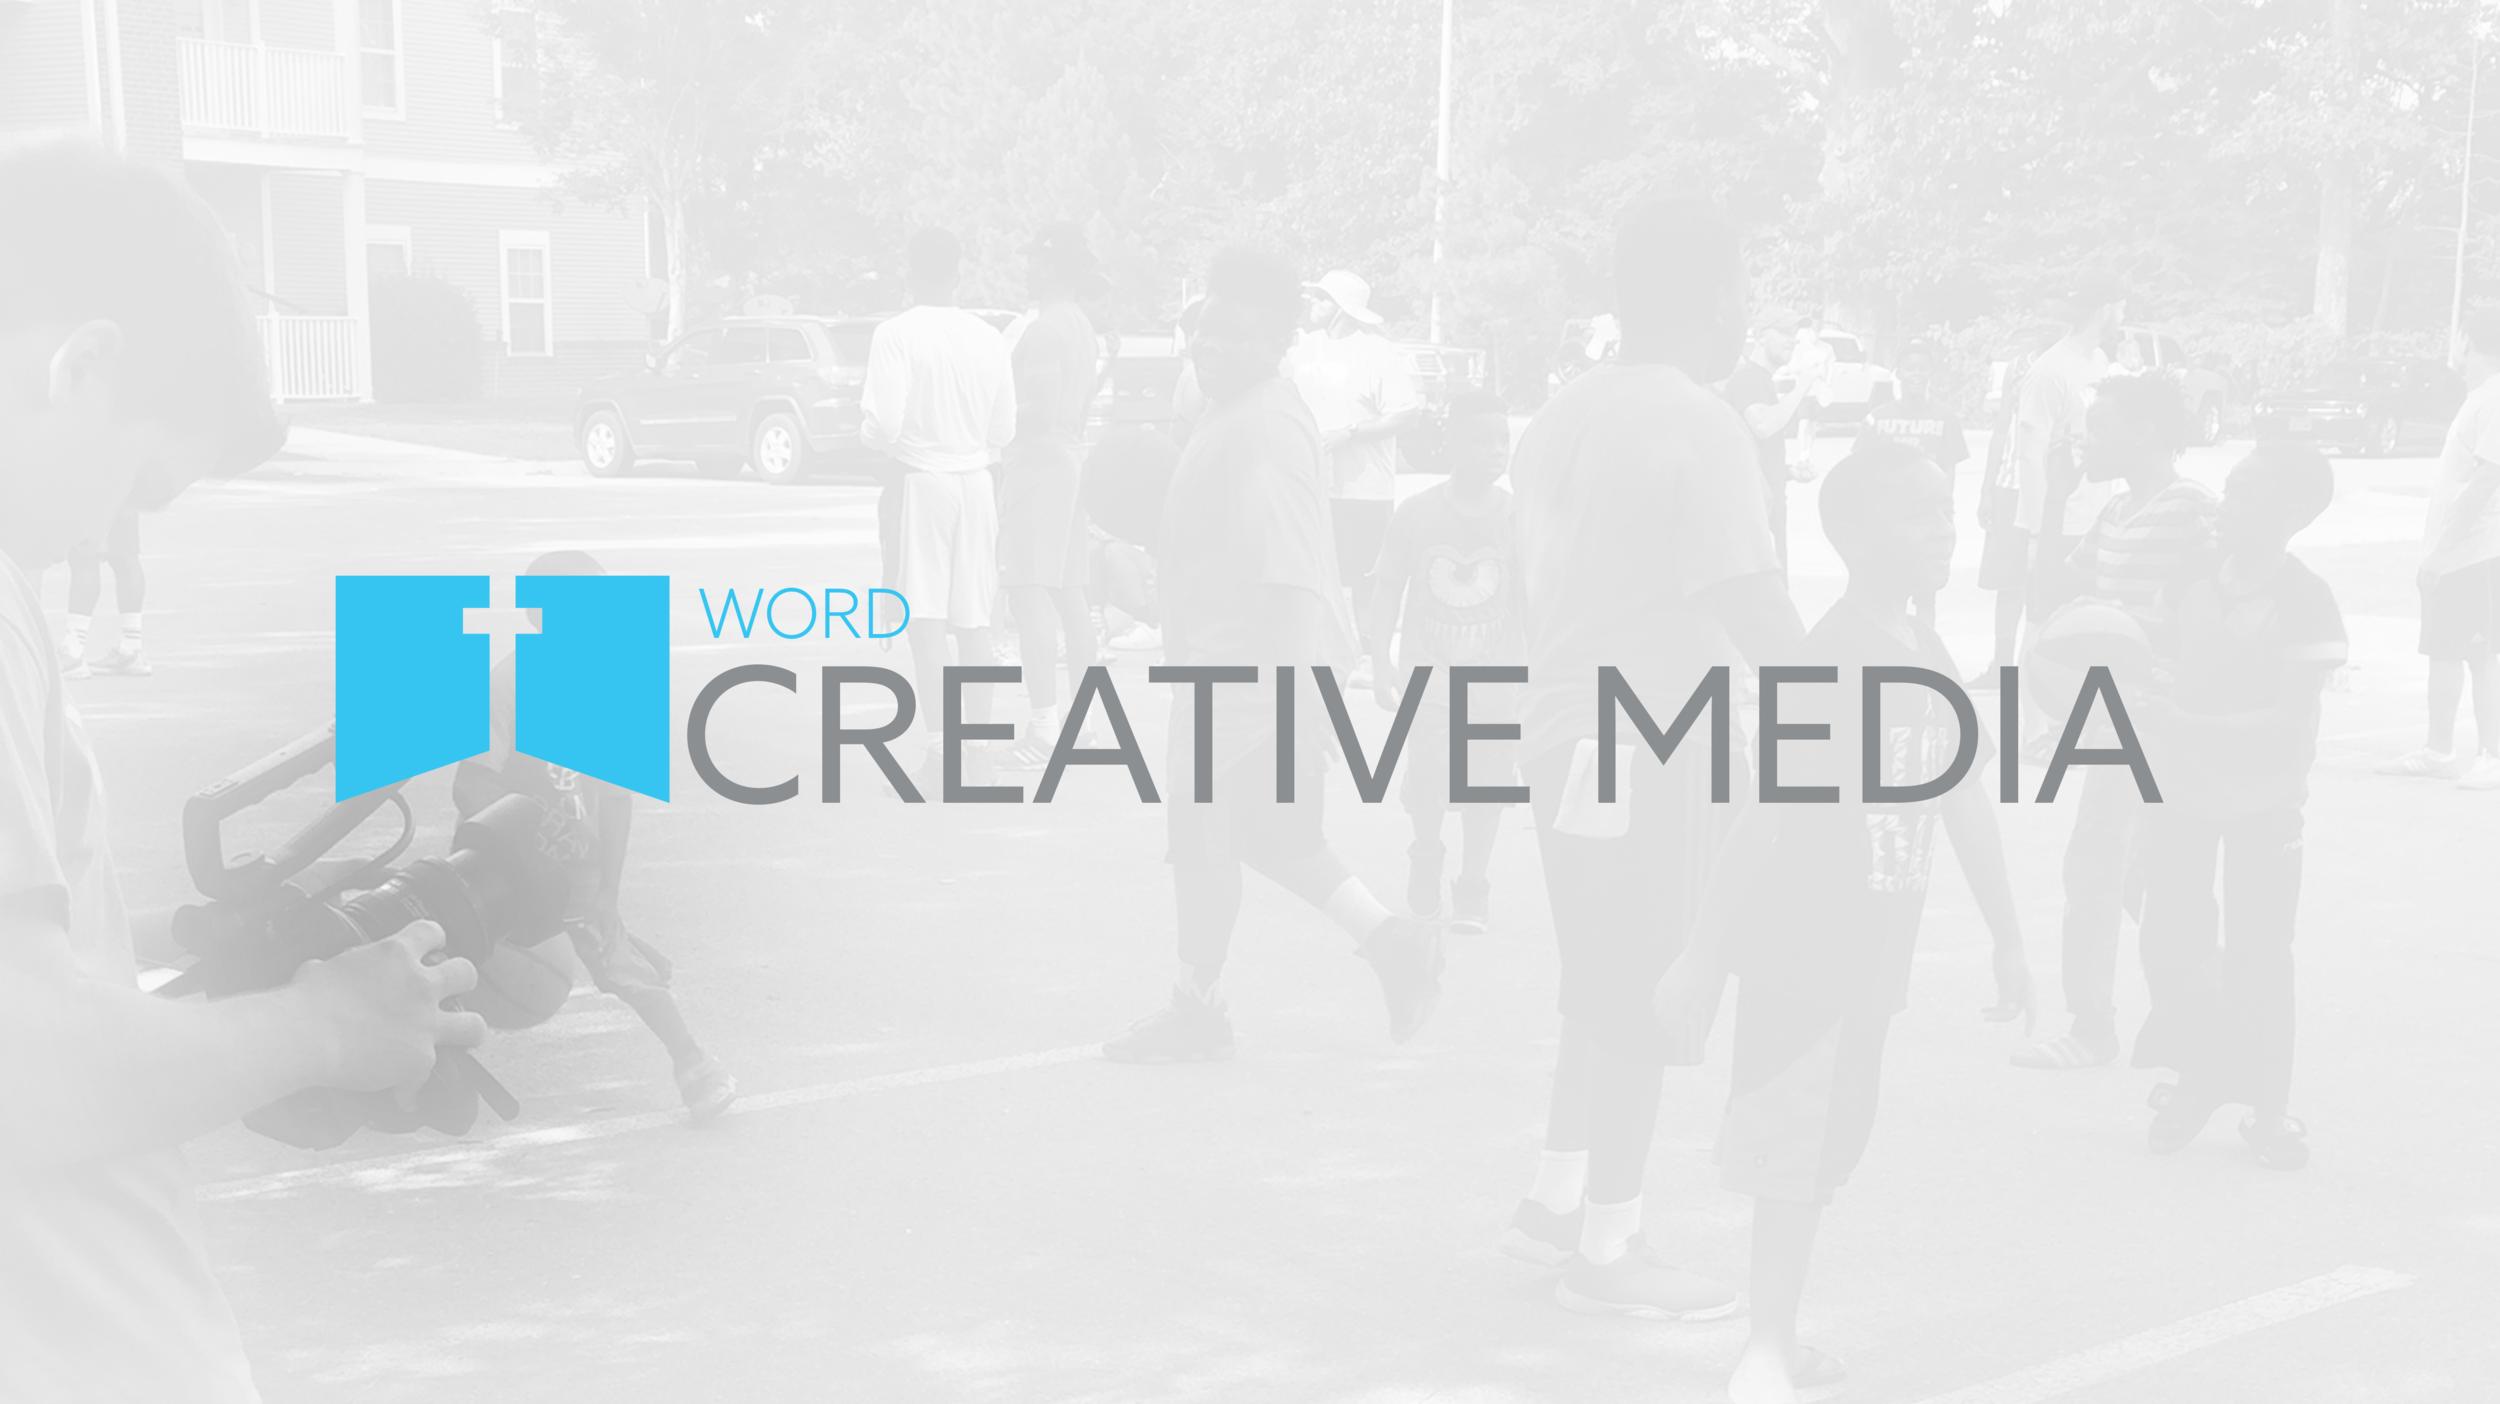 Word creative media.png